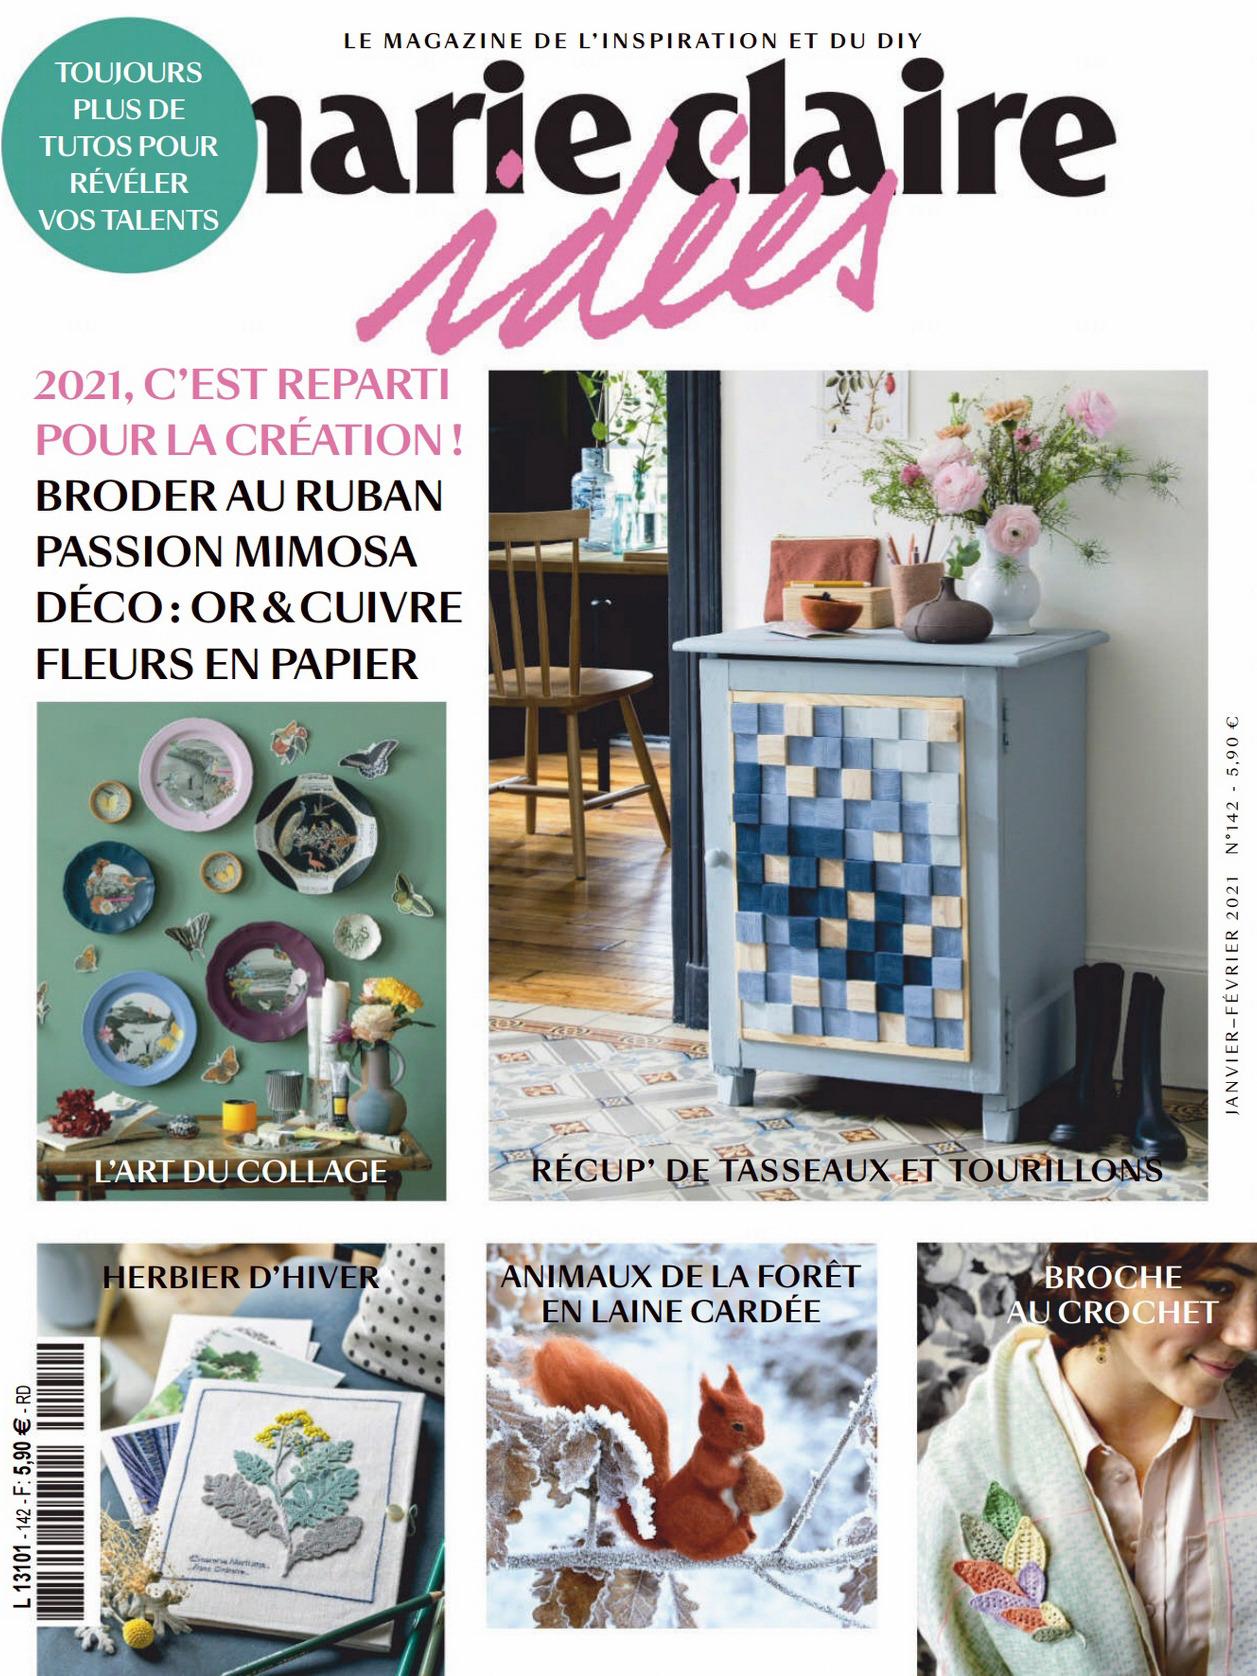 《Marie Claire Idees》法国版时尚综合杂志2020年01-02月号